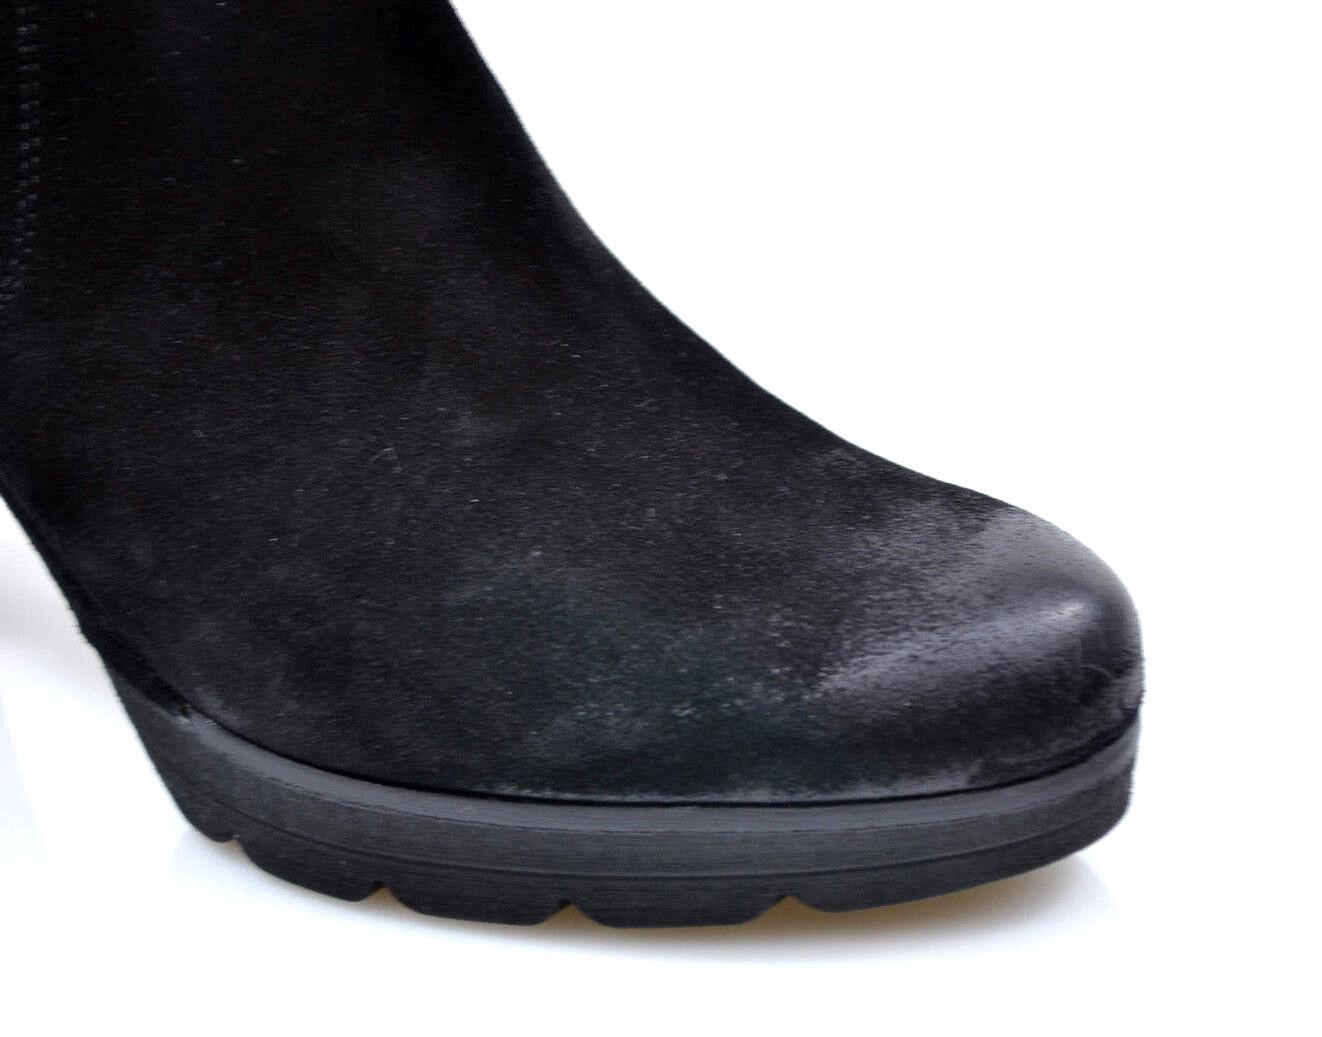 Paul Boots Green Damen Stiefelette Schuhe Boots Paul 8722 Suede schwarz Leder NEU SALE 1f6cc6